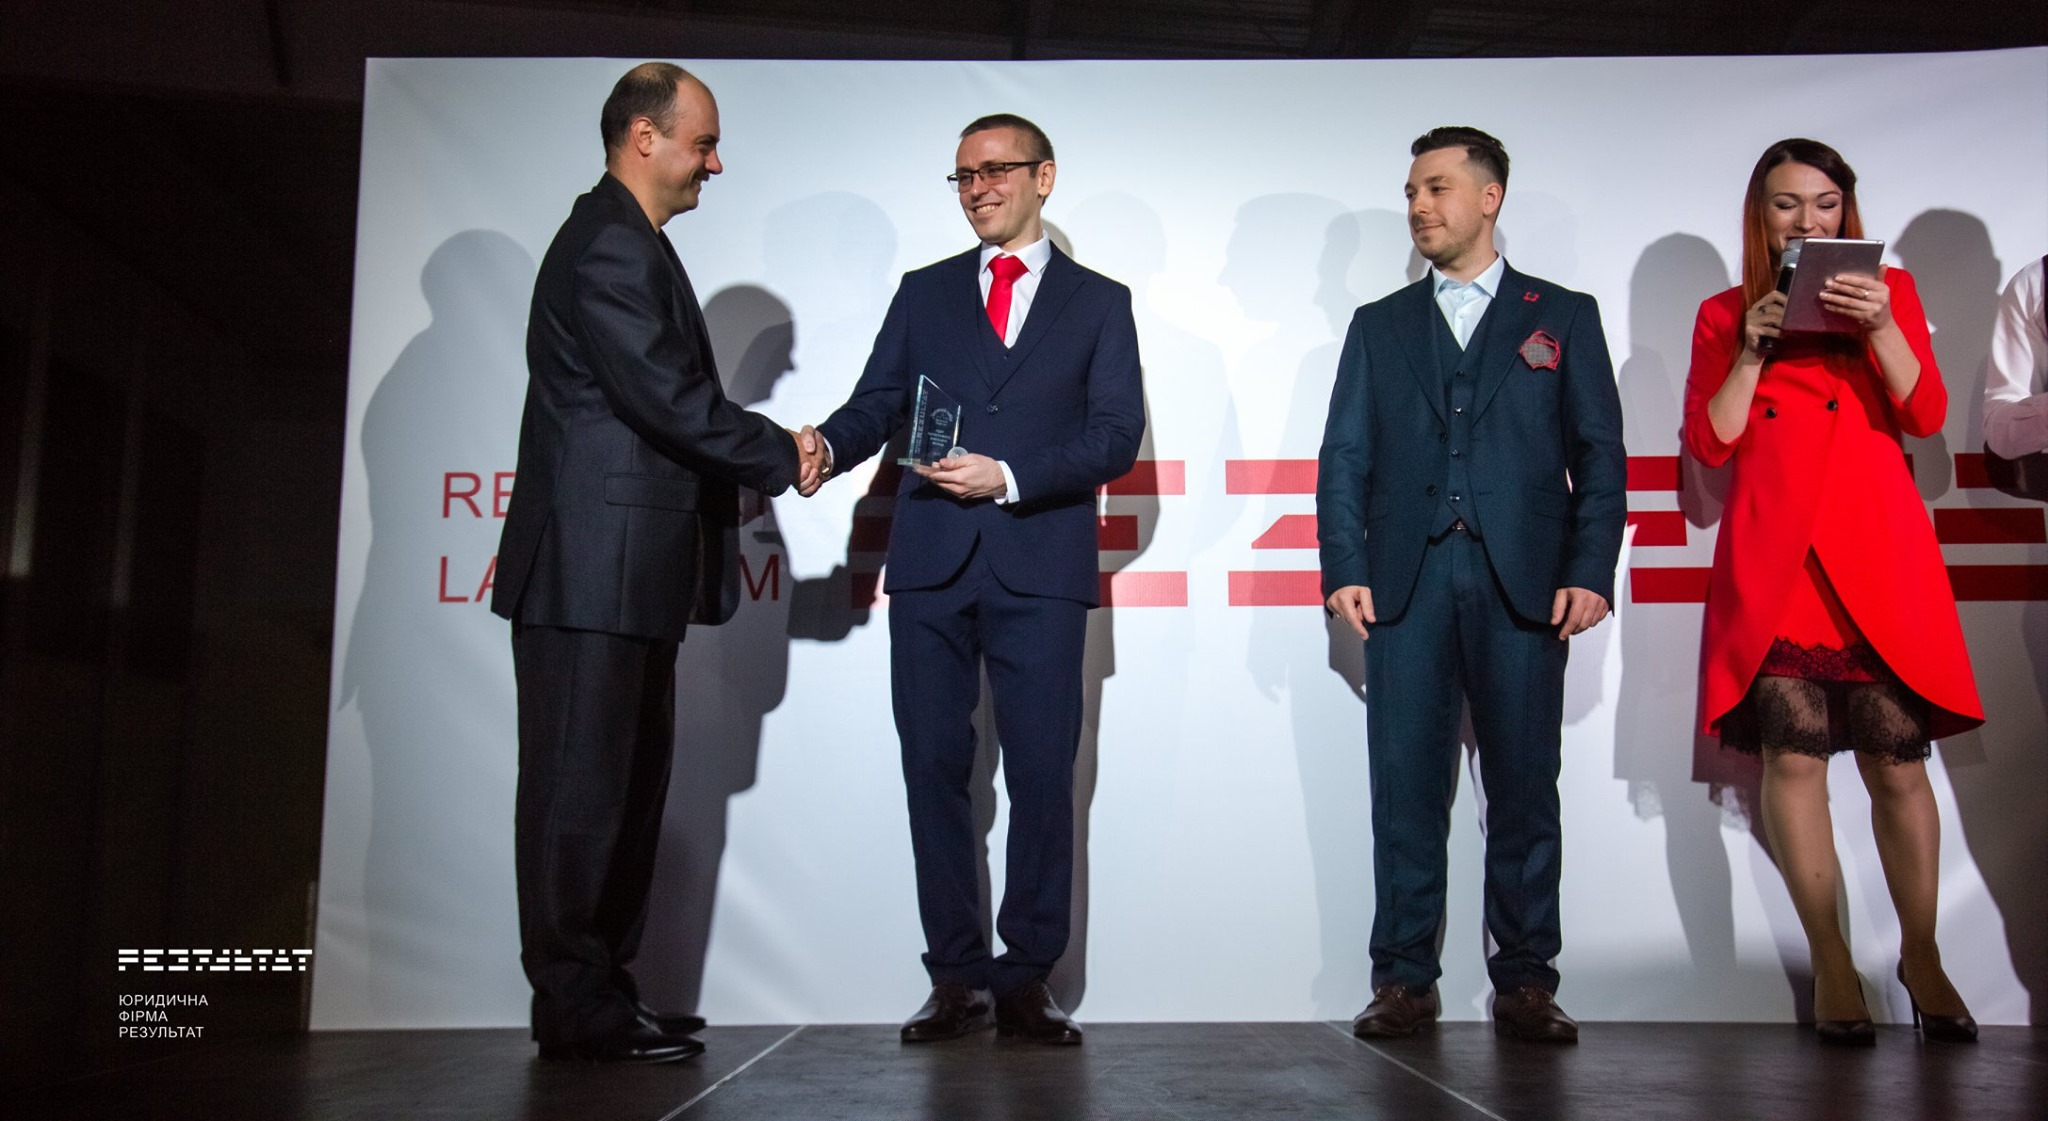 Volodimir Sherstuk in rezultat law firm